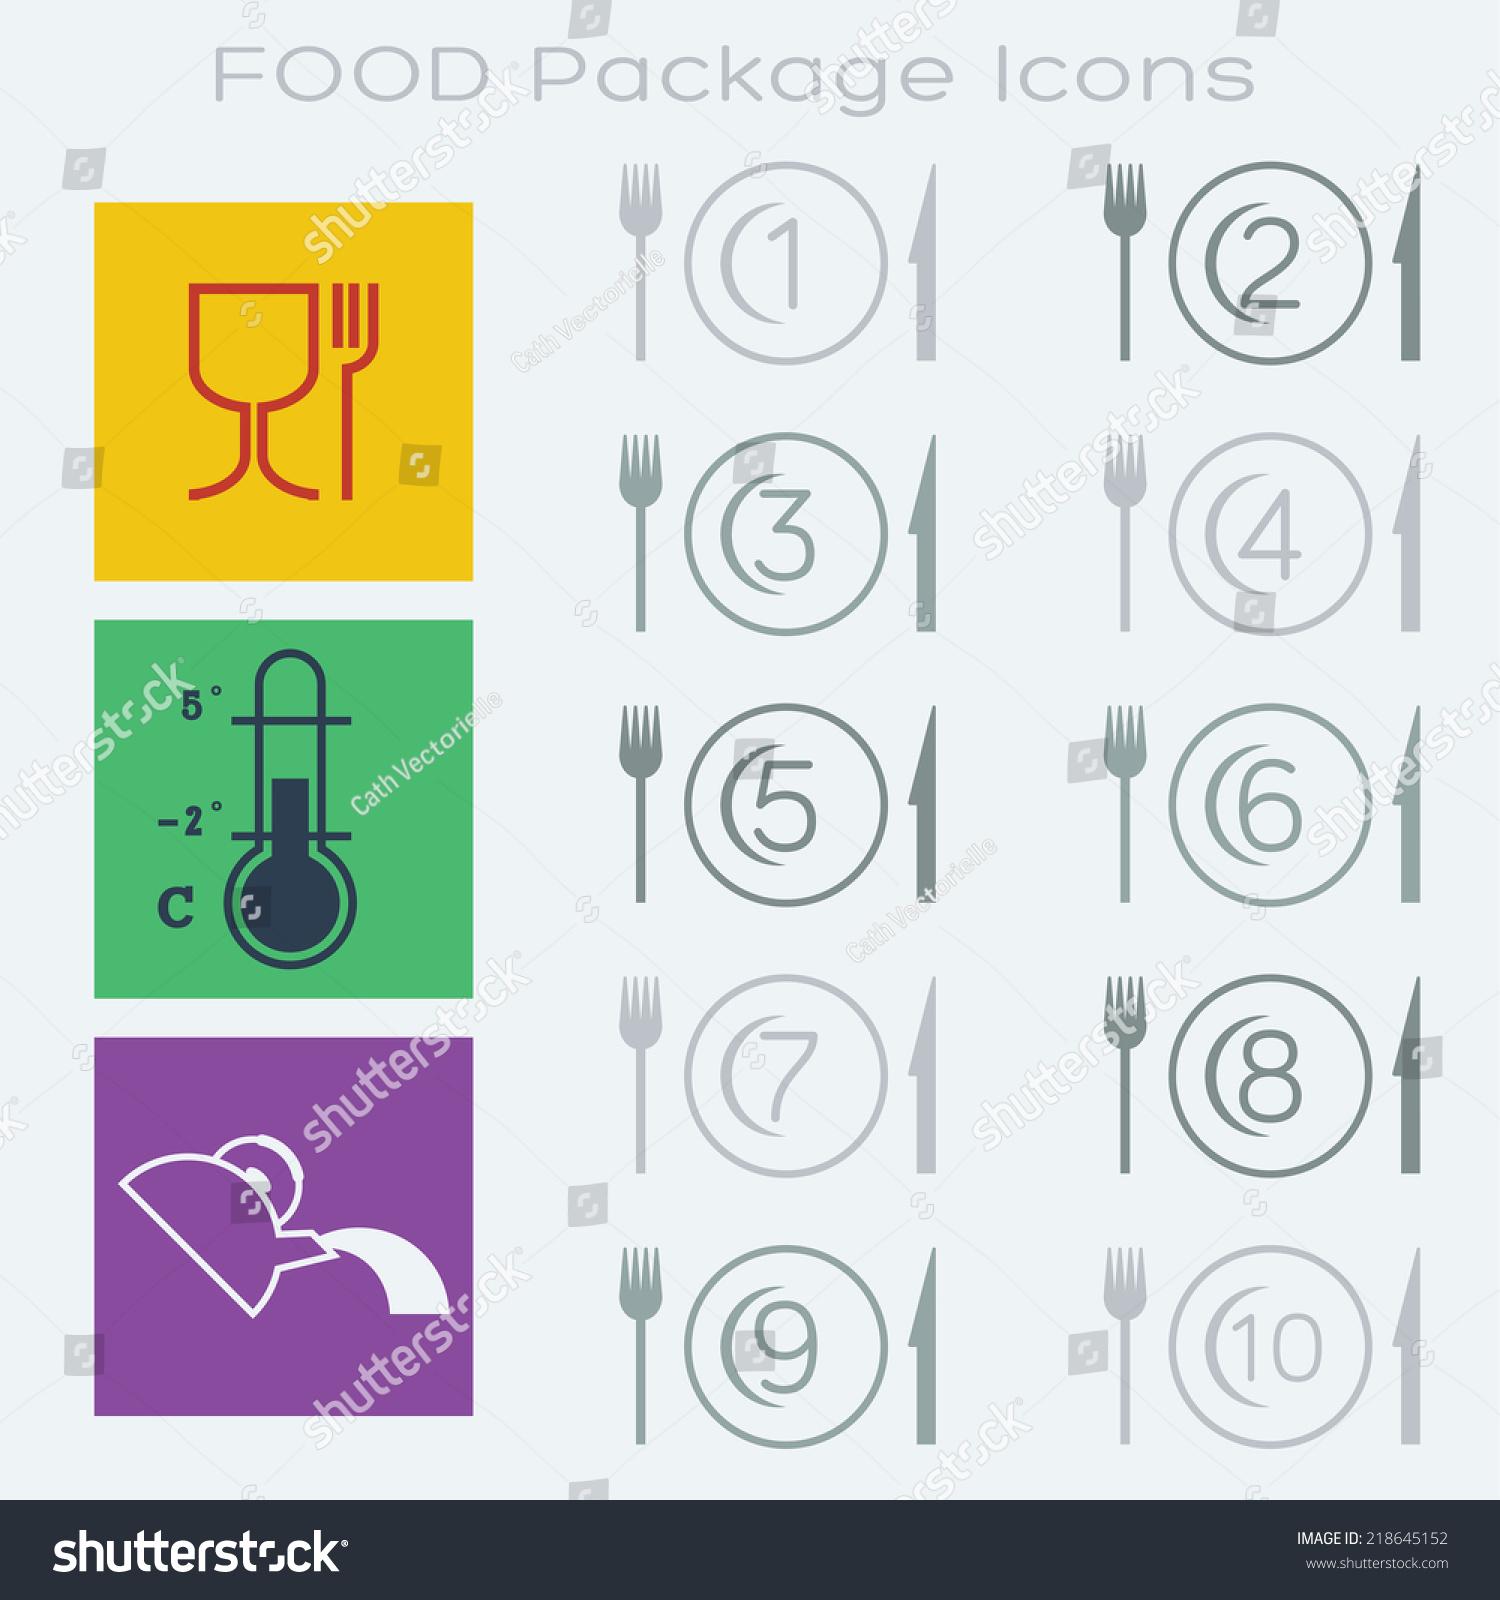 13 Food Packaging Symbols Portion Instructions Stock Illustration